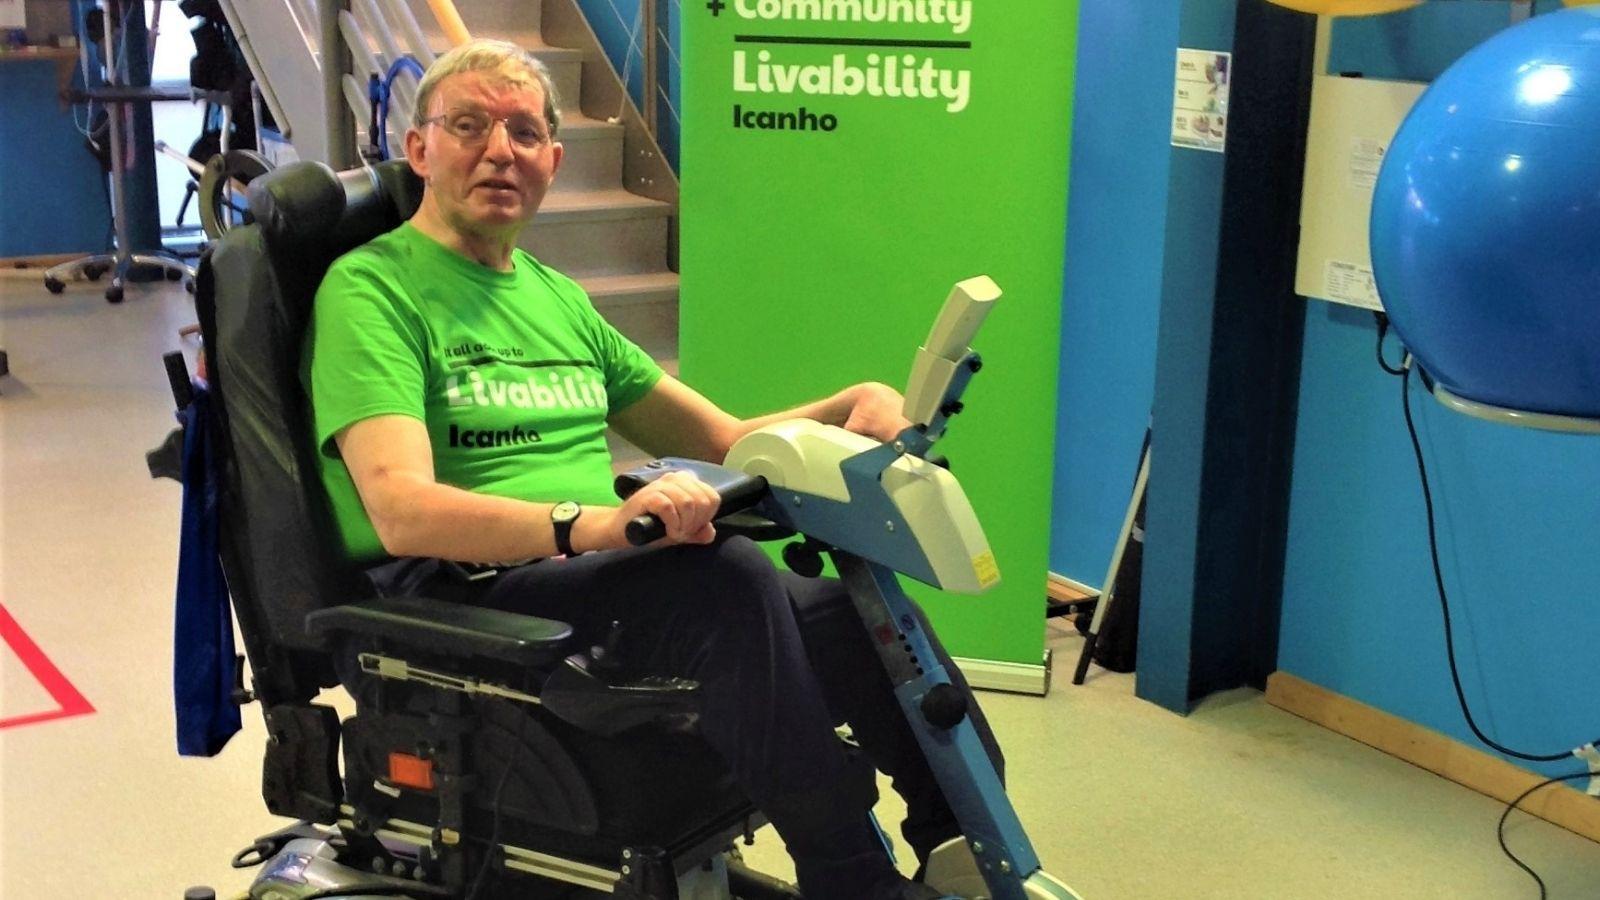 Ian using assistive bike at Icanho